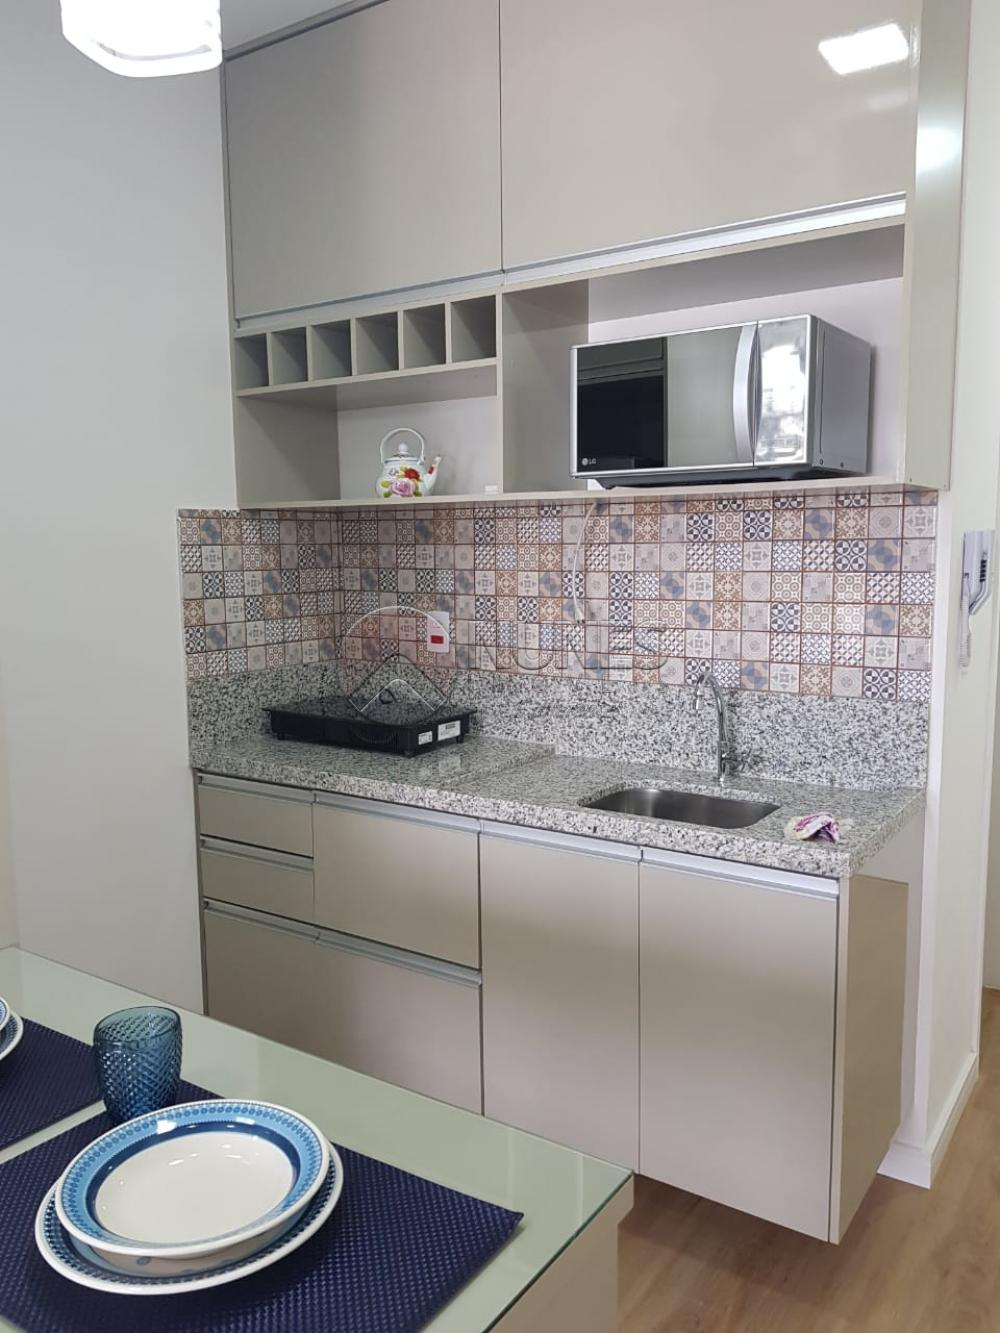 Comprar Apartamento / Flat em Cotia R$ 300.000,00 - Foto 6